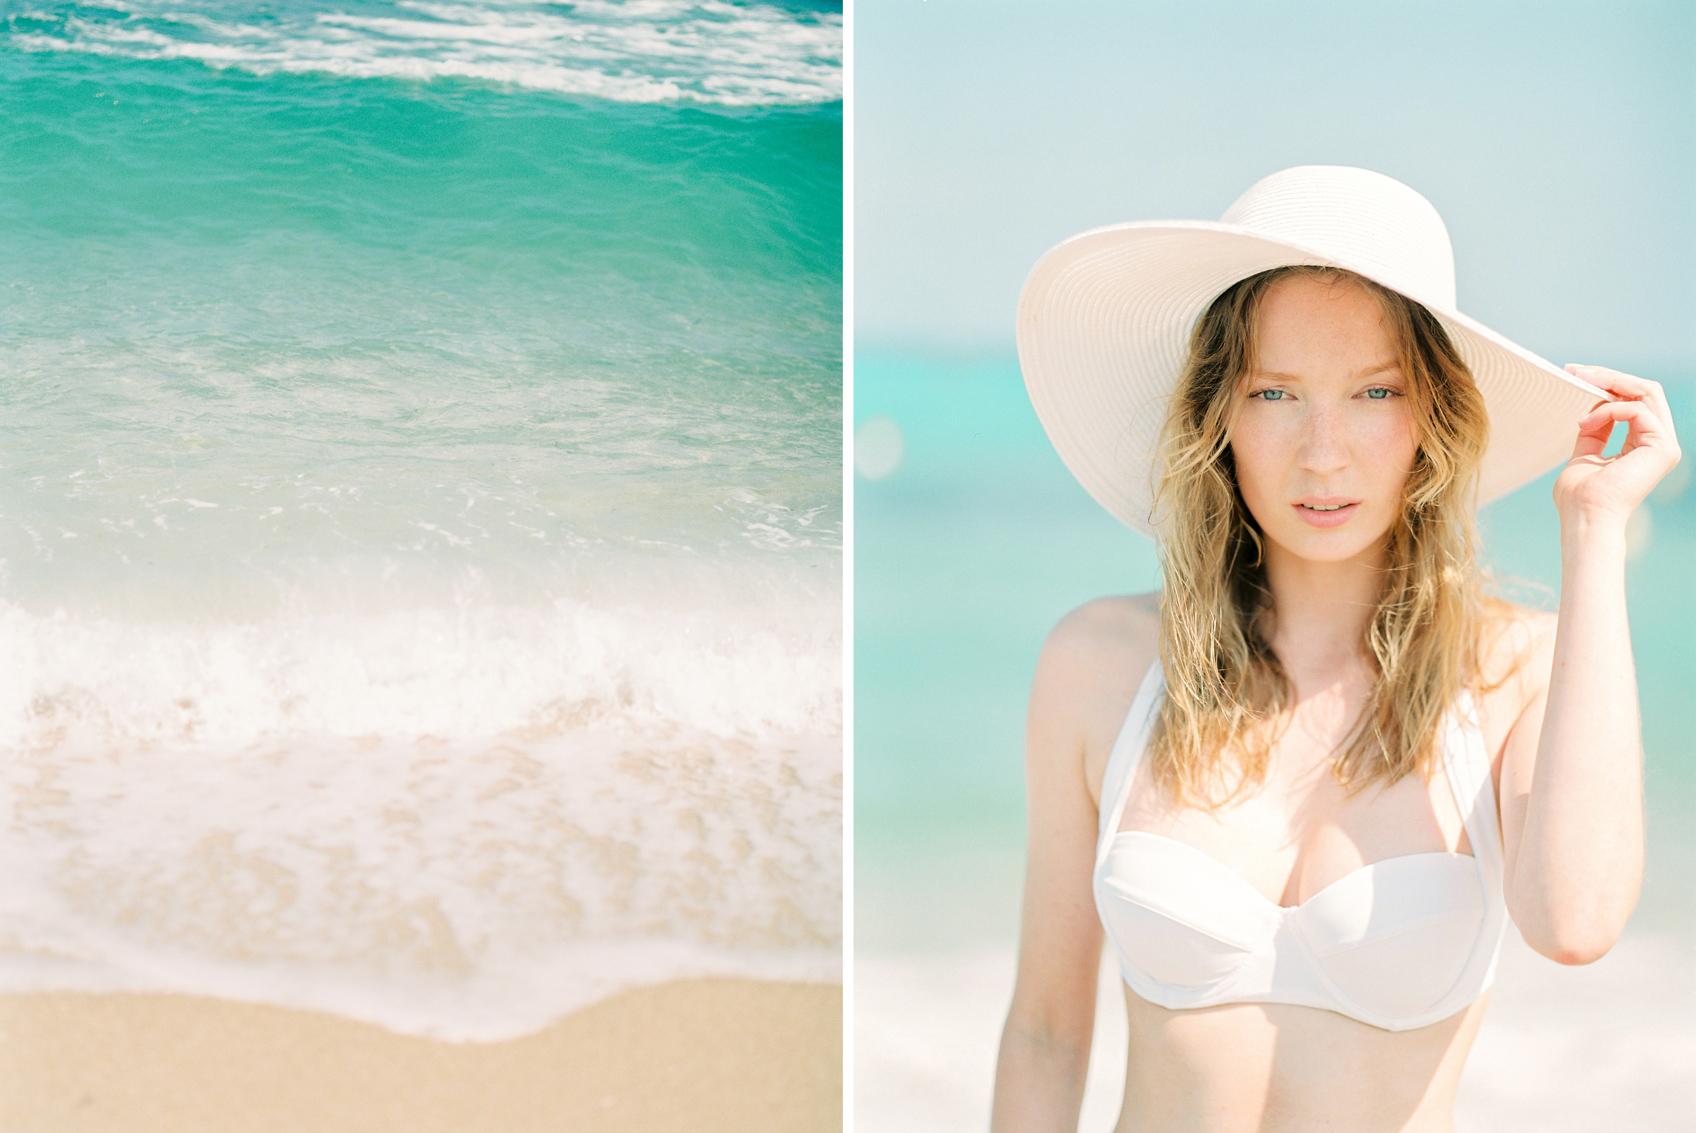 Saint Tropez Honeymoon Photo Session by Ashley Ludaescher Photography (13)